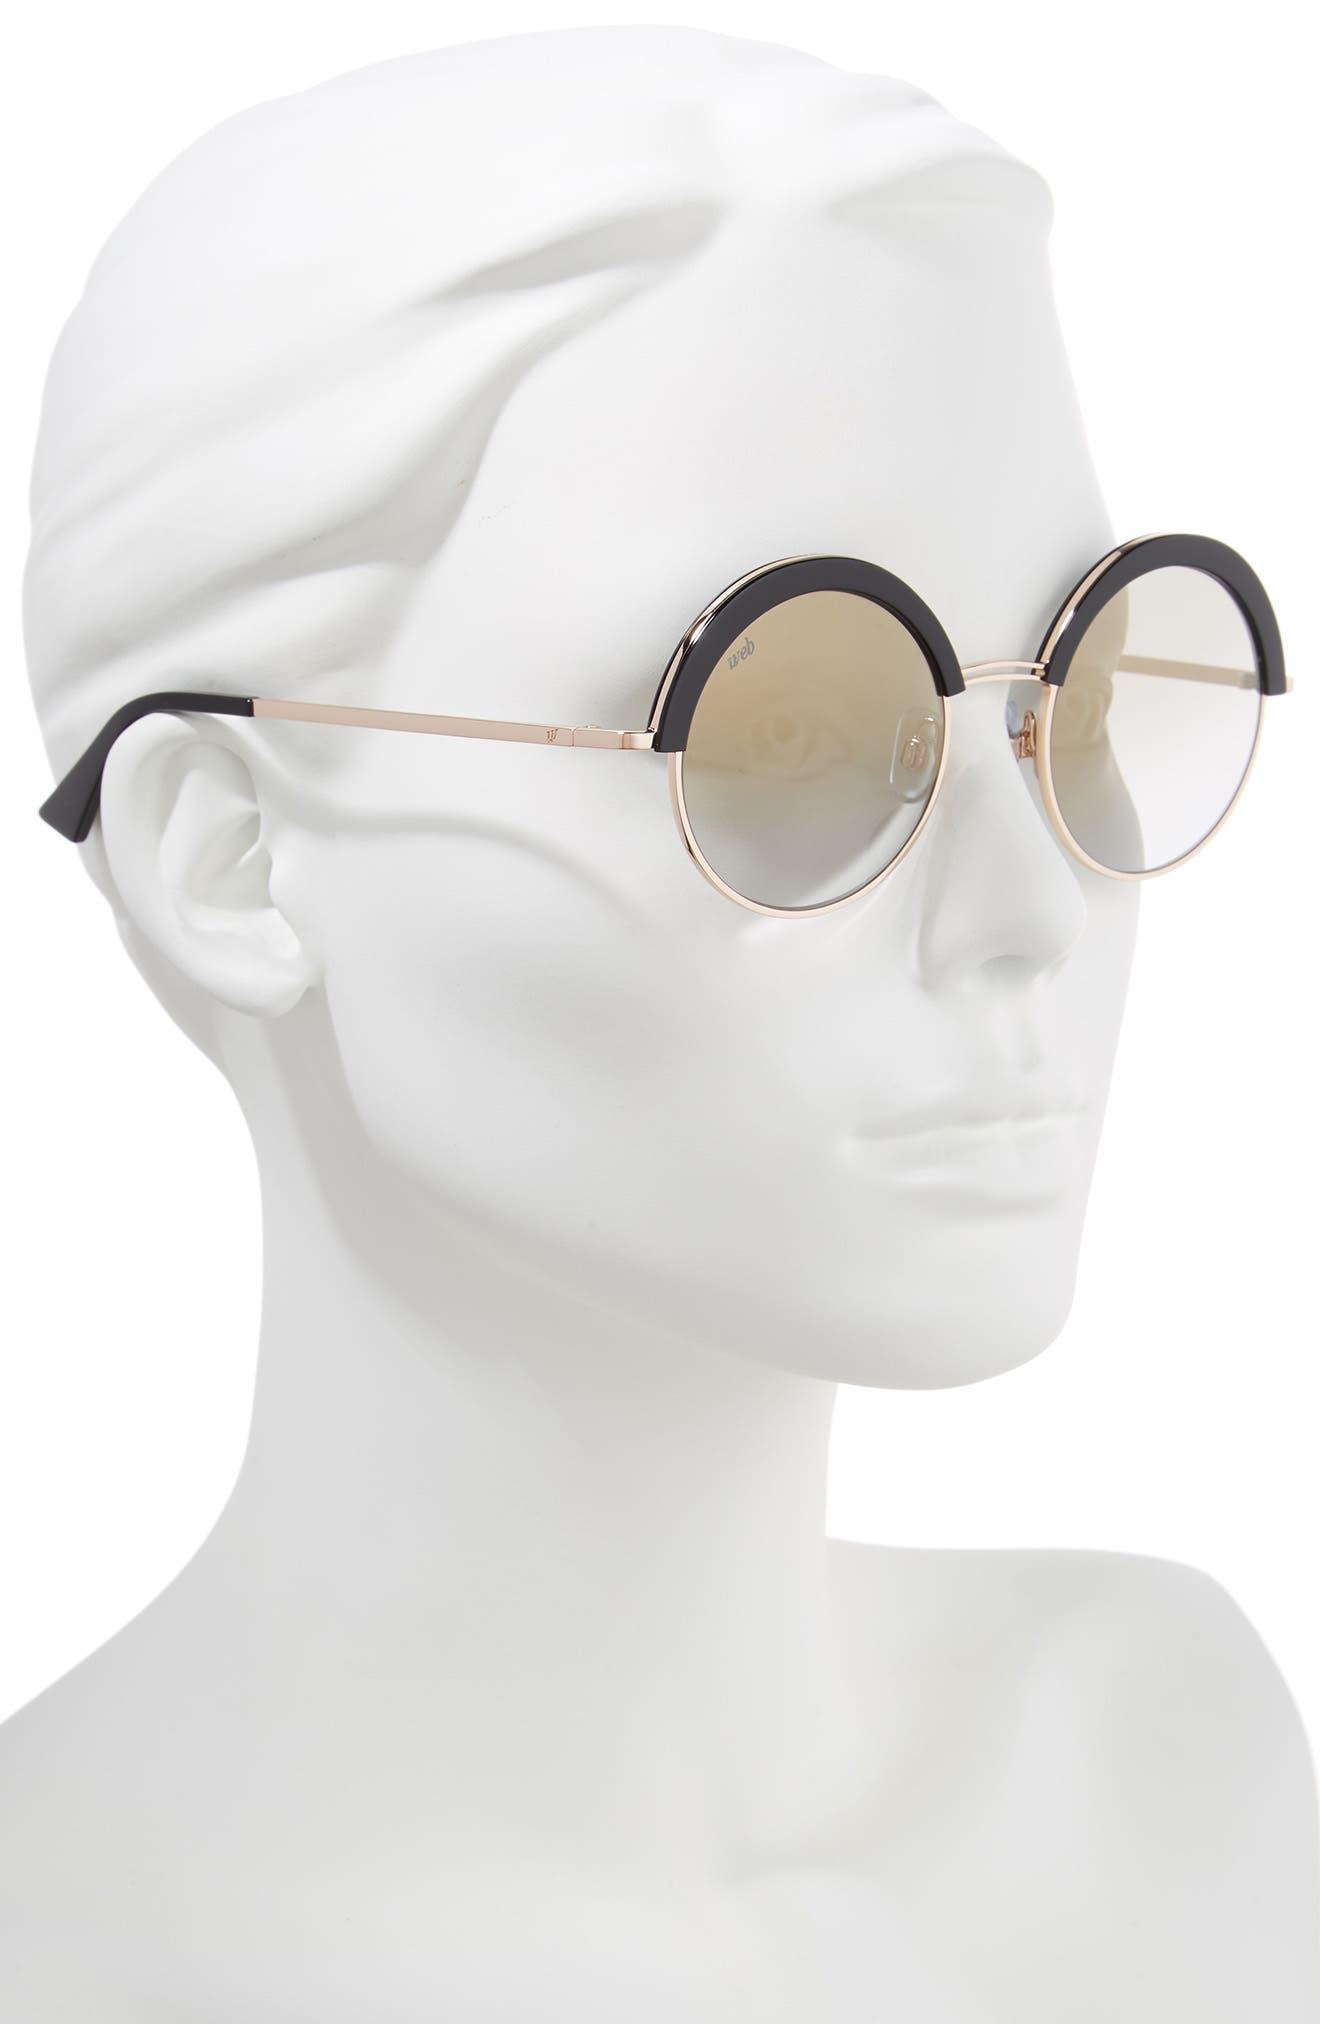 51mm Round Sunglasses,                             Alternate thumbnail 2, color,                             SHINY BLACK/ SMOKE MIRROR